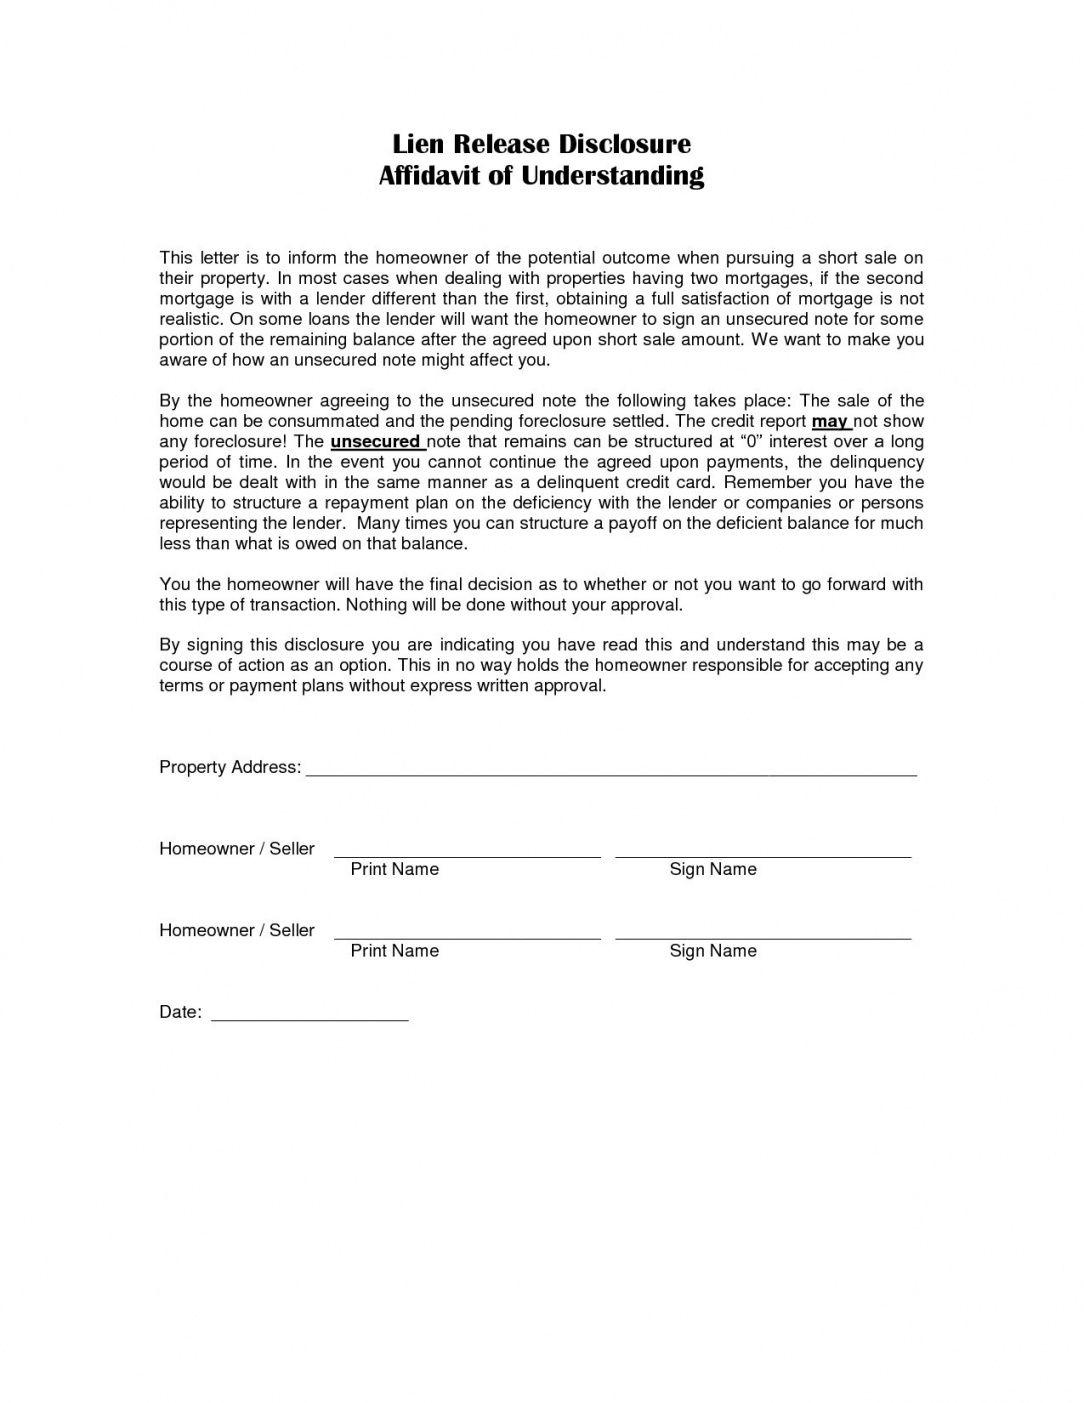 Lien Release Letter Template In 2020 Letter Templates Lettering